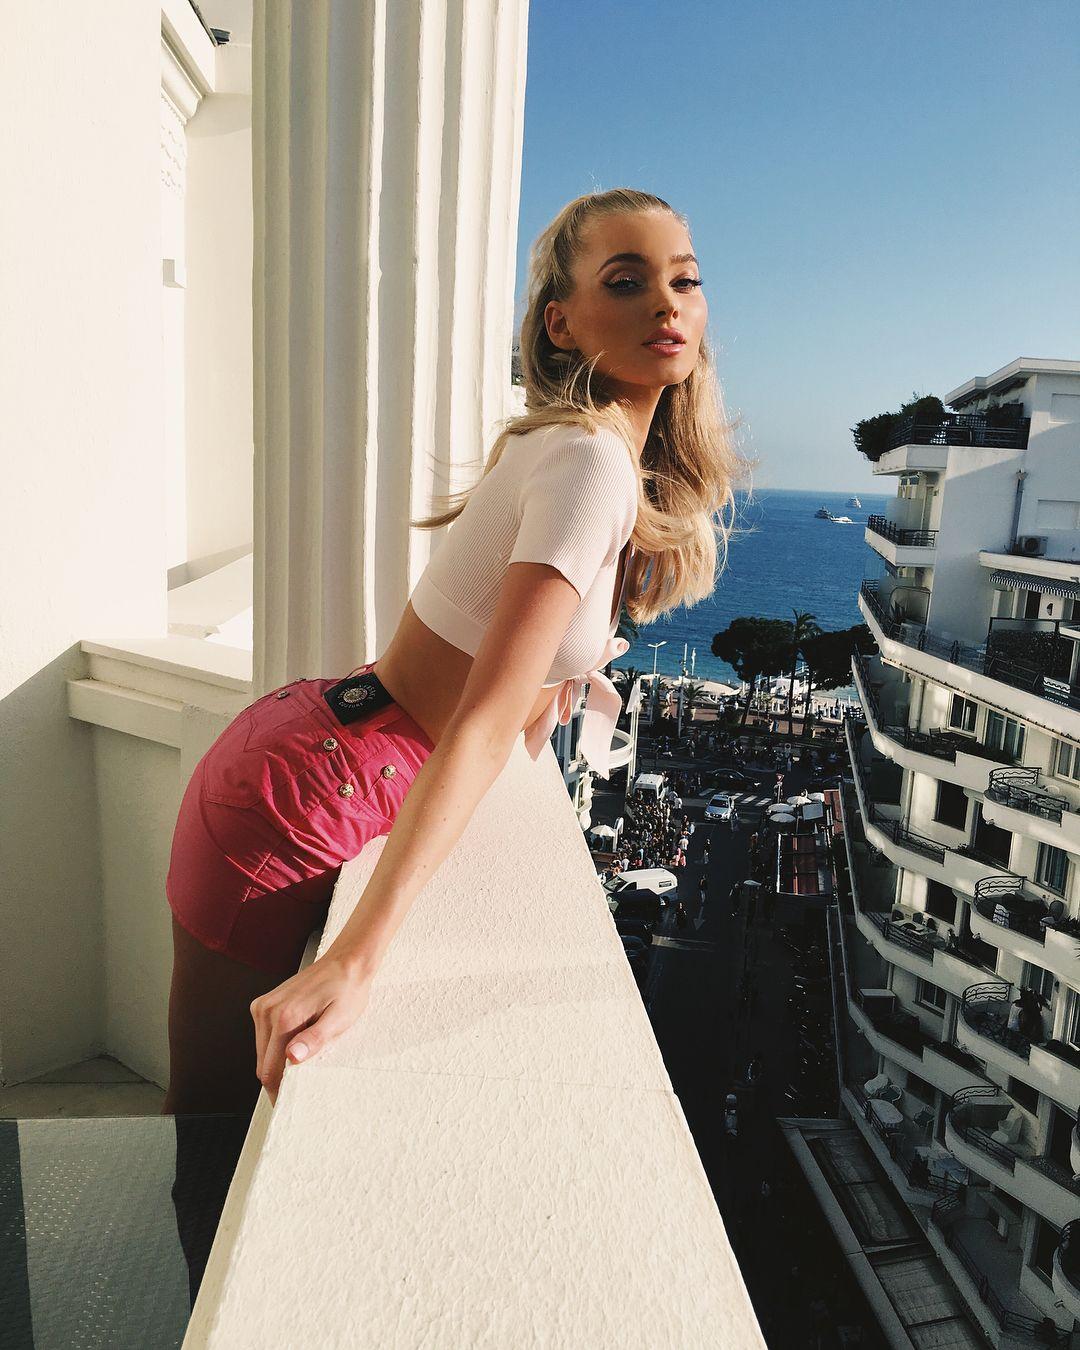 Video Elsa Hosk Videoy nude (28 photos), Pussy, Hot, Selfie, lingerie 2015